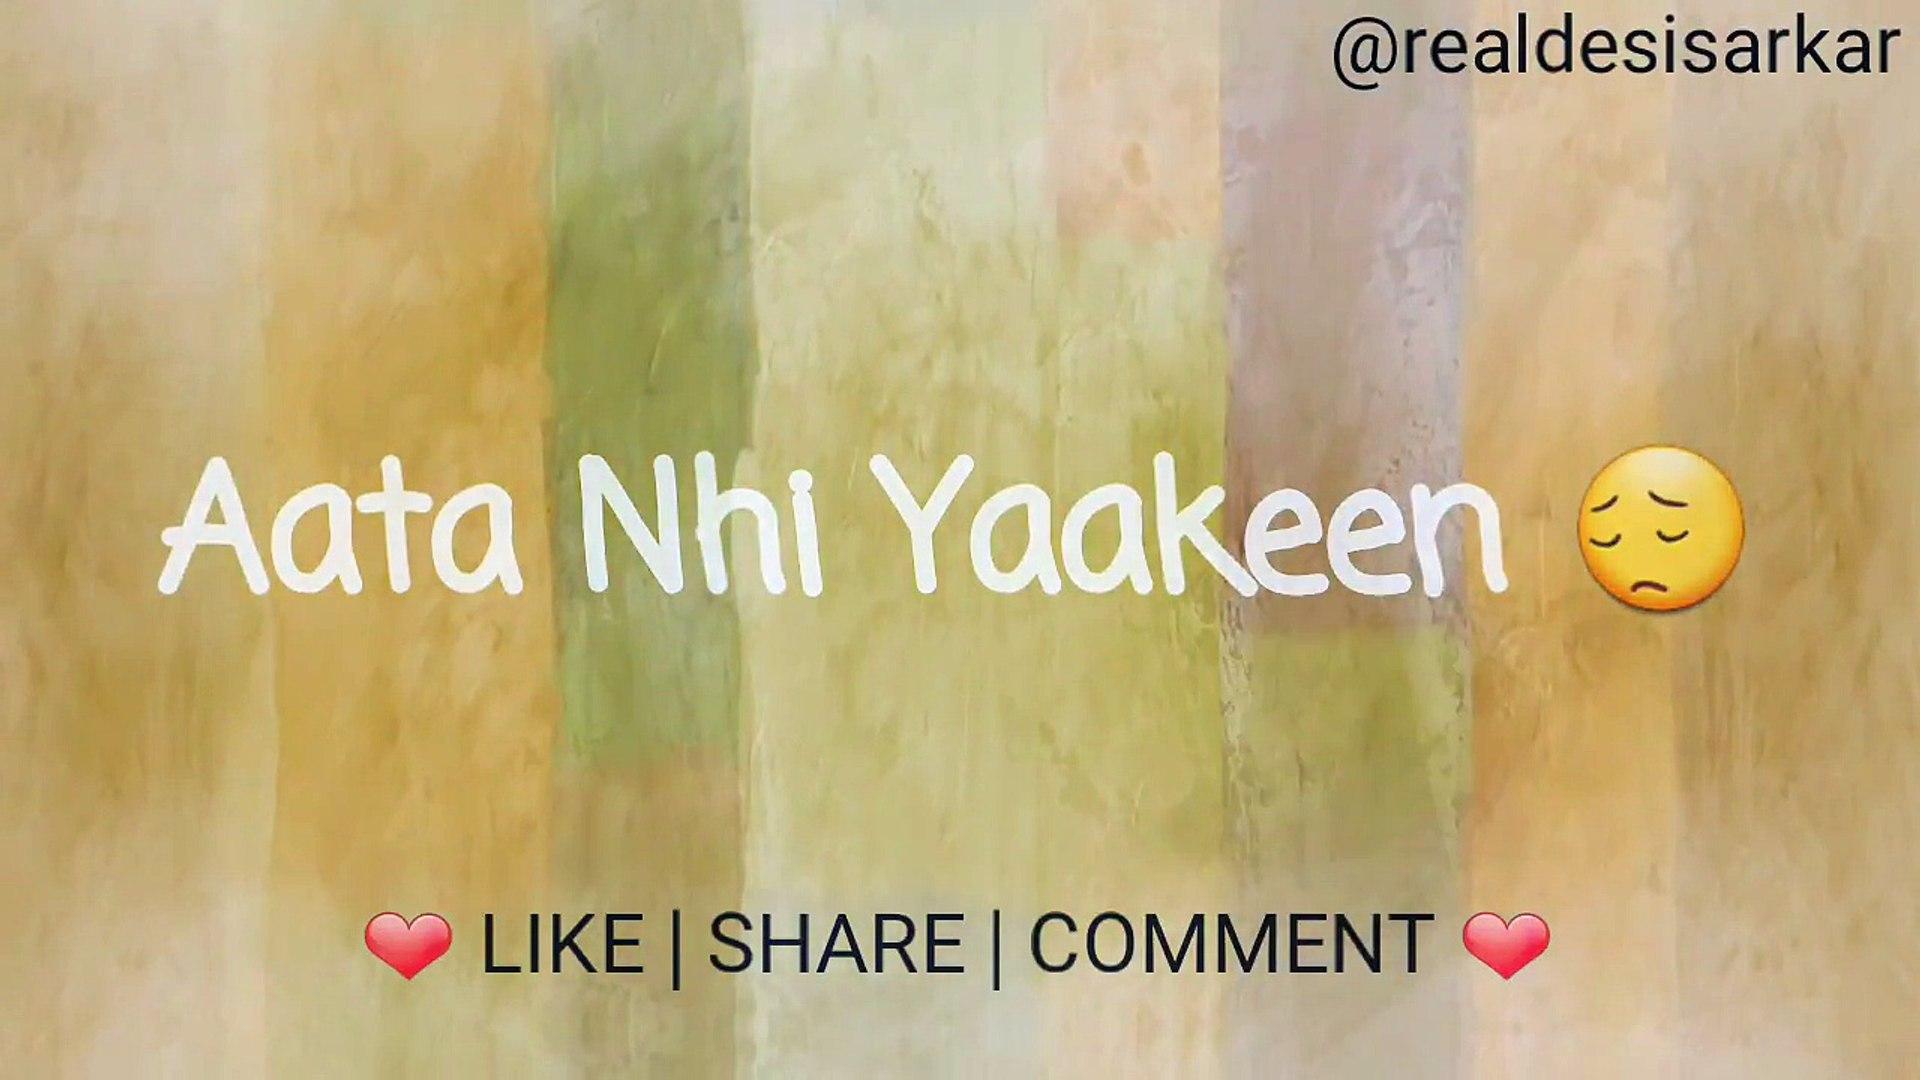 Sorry Babu Mujhe Maaf Kardo Beautiful Whatsapp Status Video 30sec Sad Song Lyrical Video